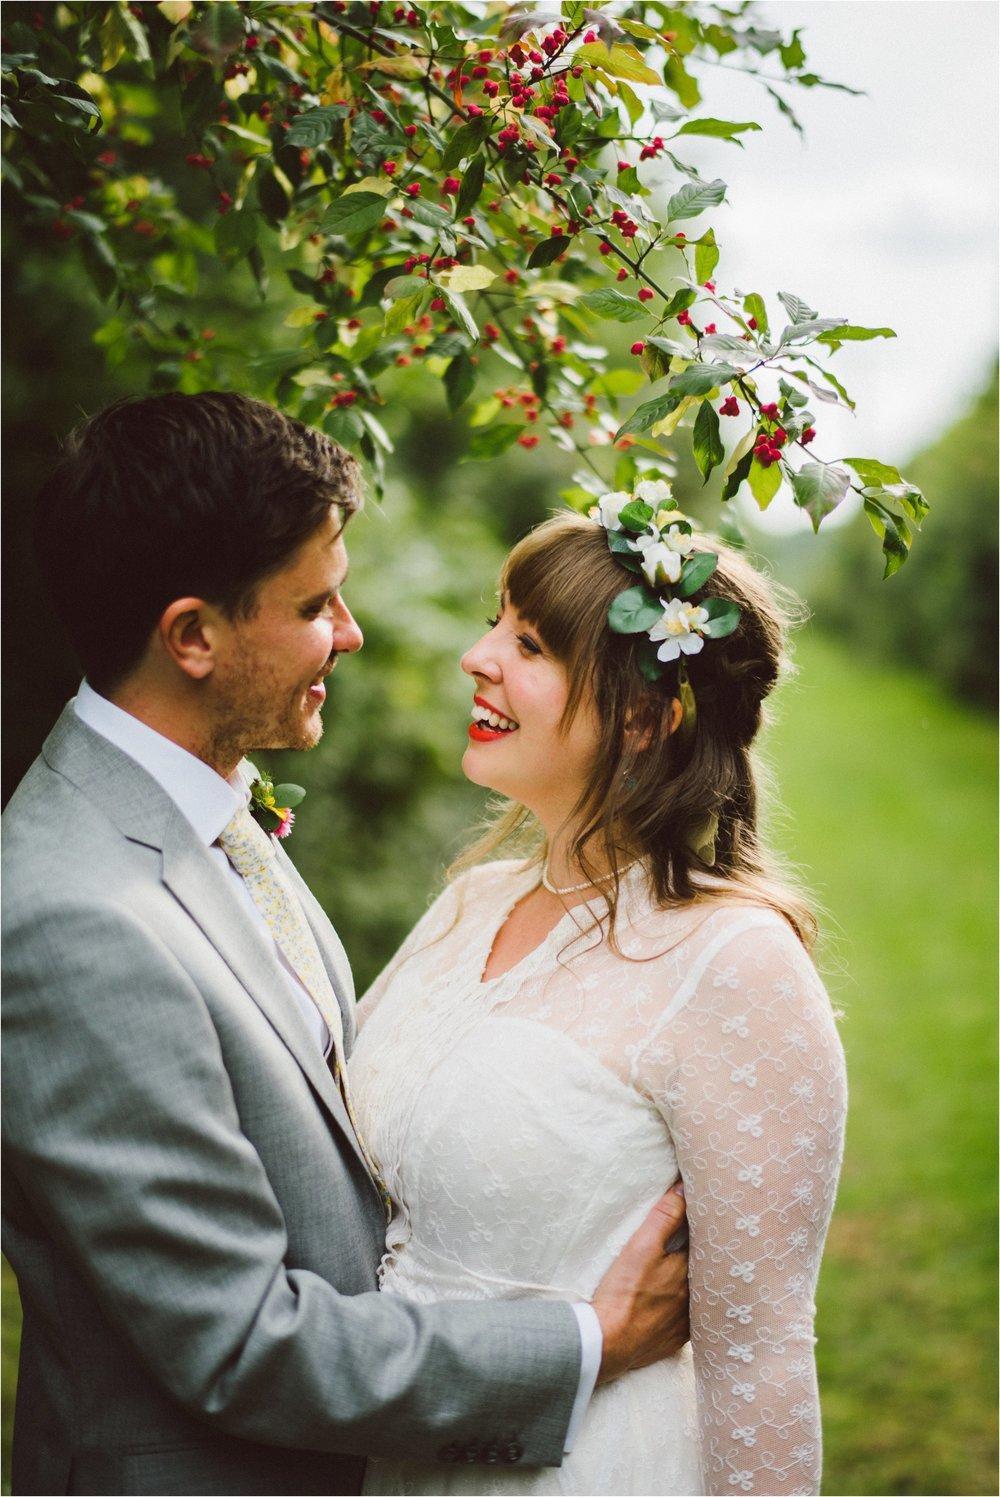 Gloucestershire outdoor wedding photographer_0100.jpg